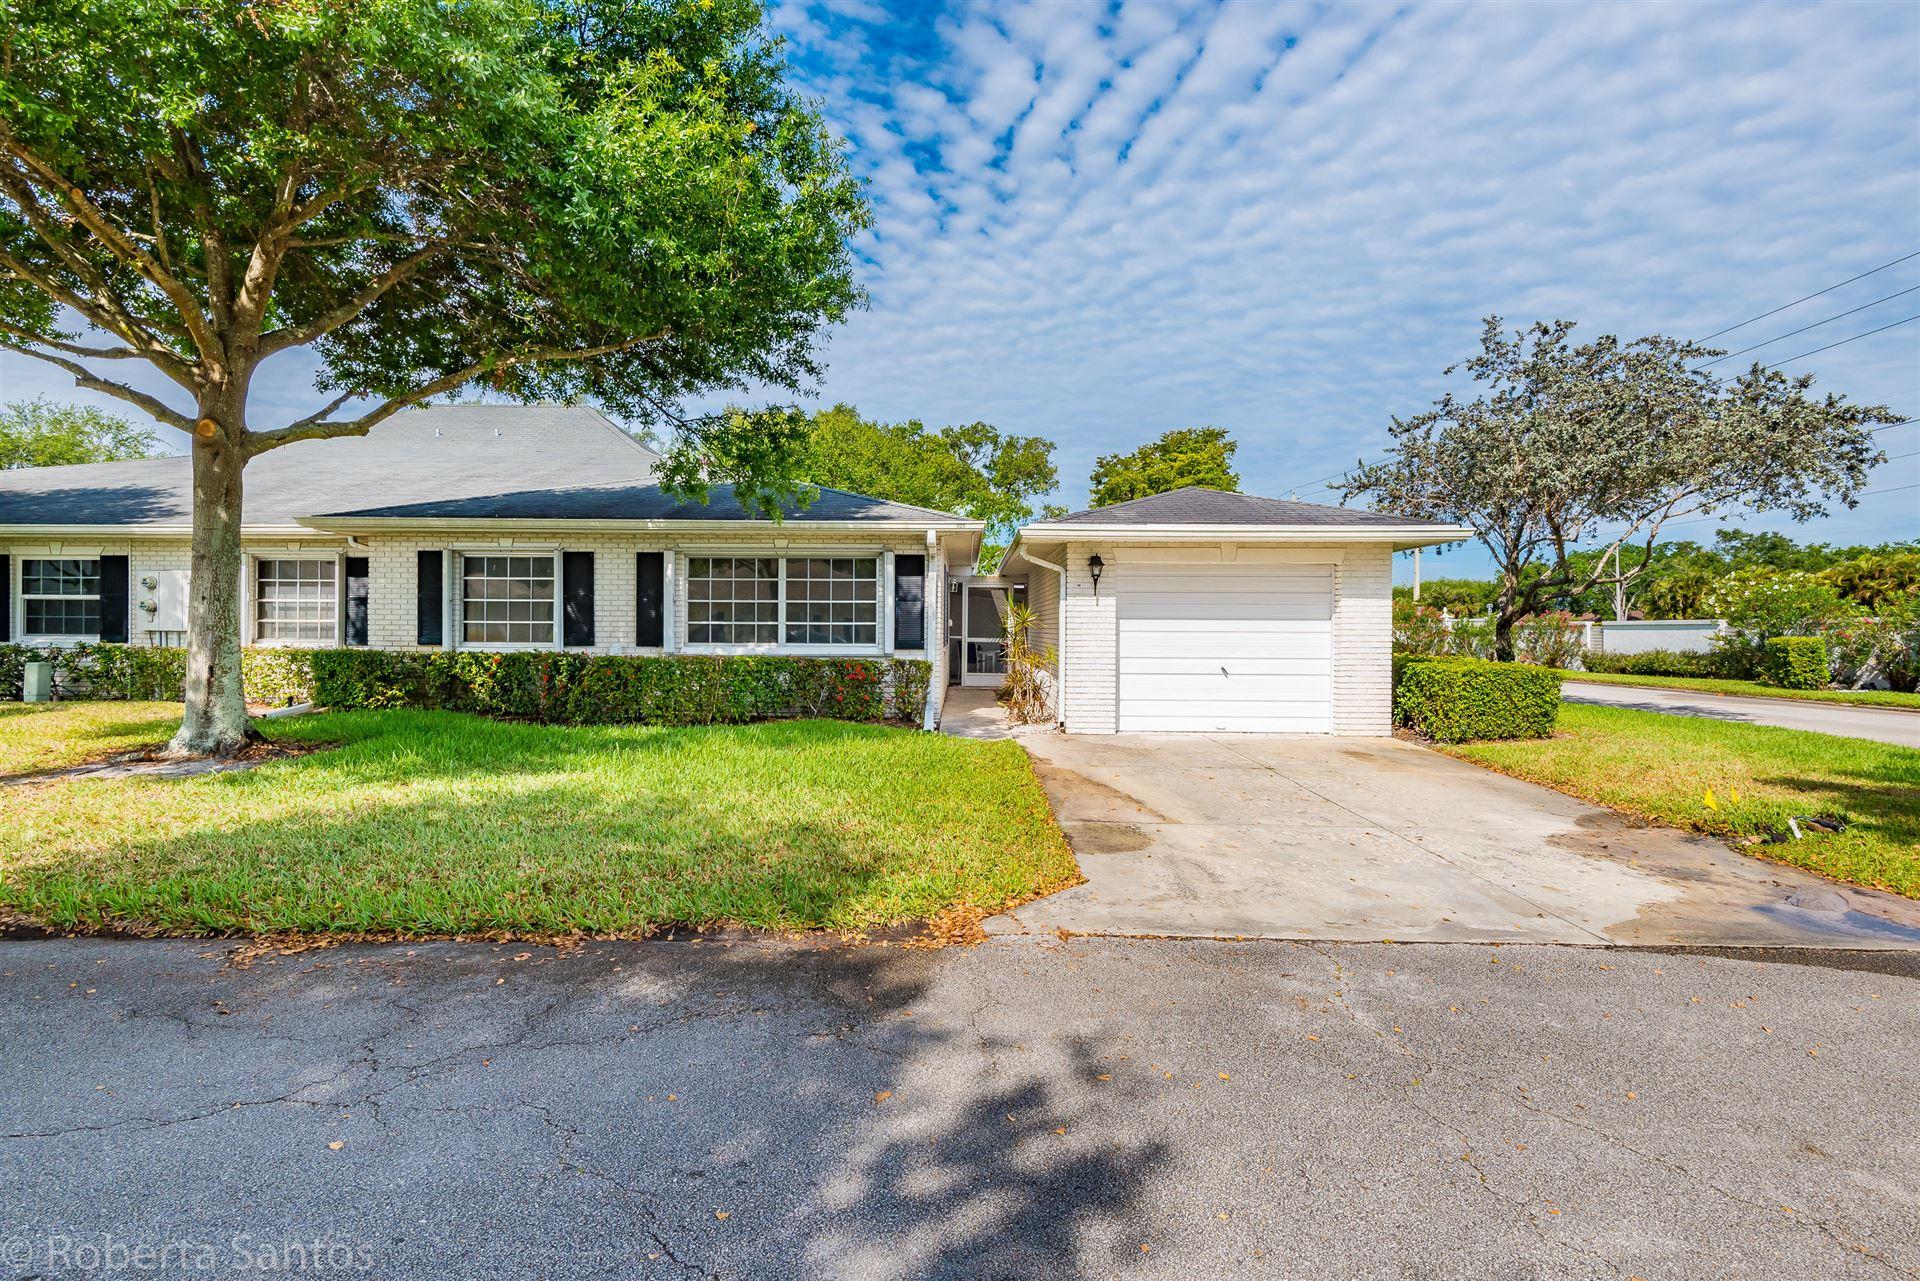 10079 S 42nd Drive #101, Boynton Beach, FL 33436 - #: RX-10615069